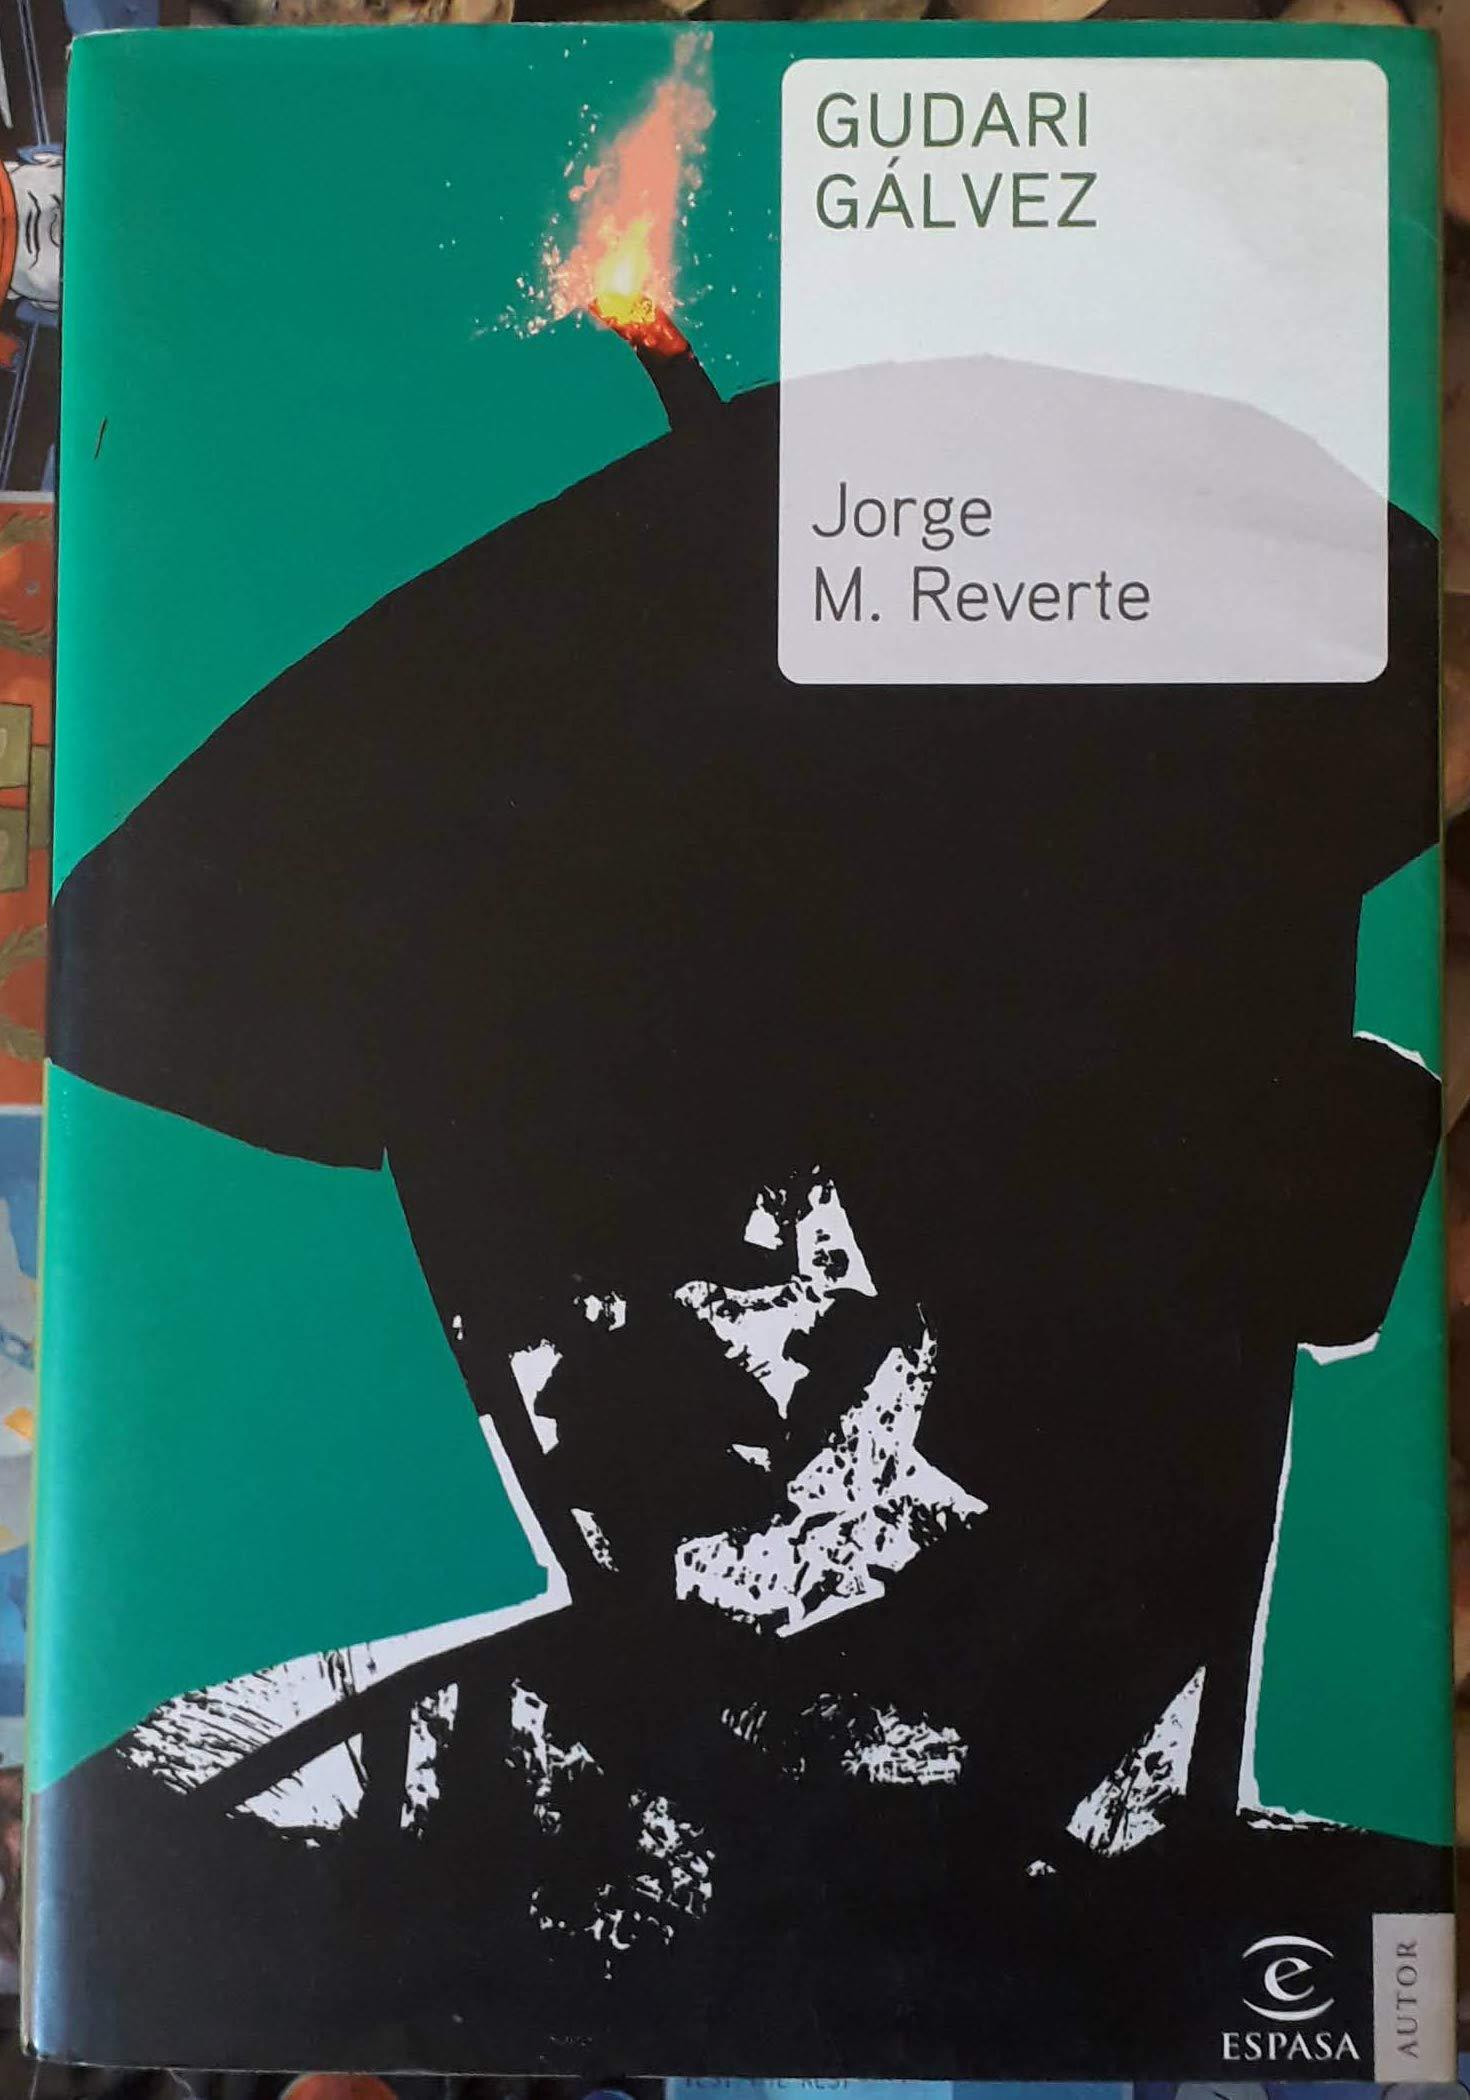 Gudari Gálvez (ESPASA NARRATIVA): Amazon.es: Reverte, Jorge M.: Libros